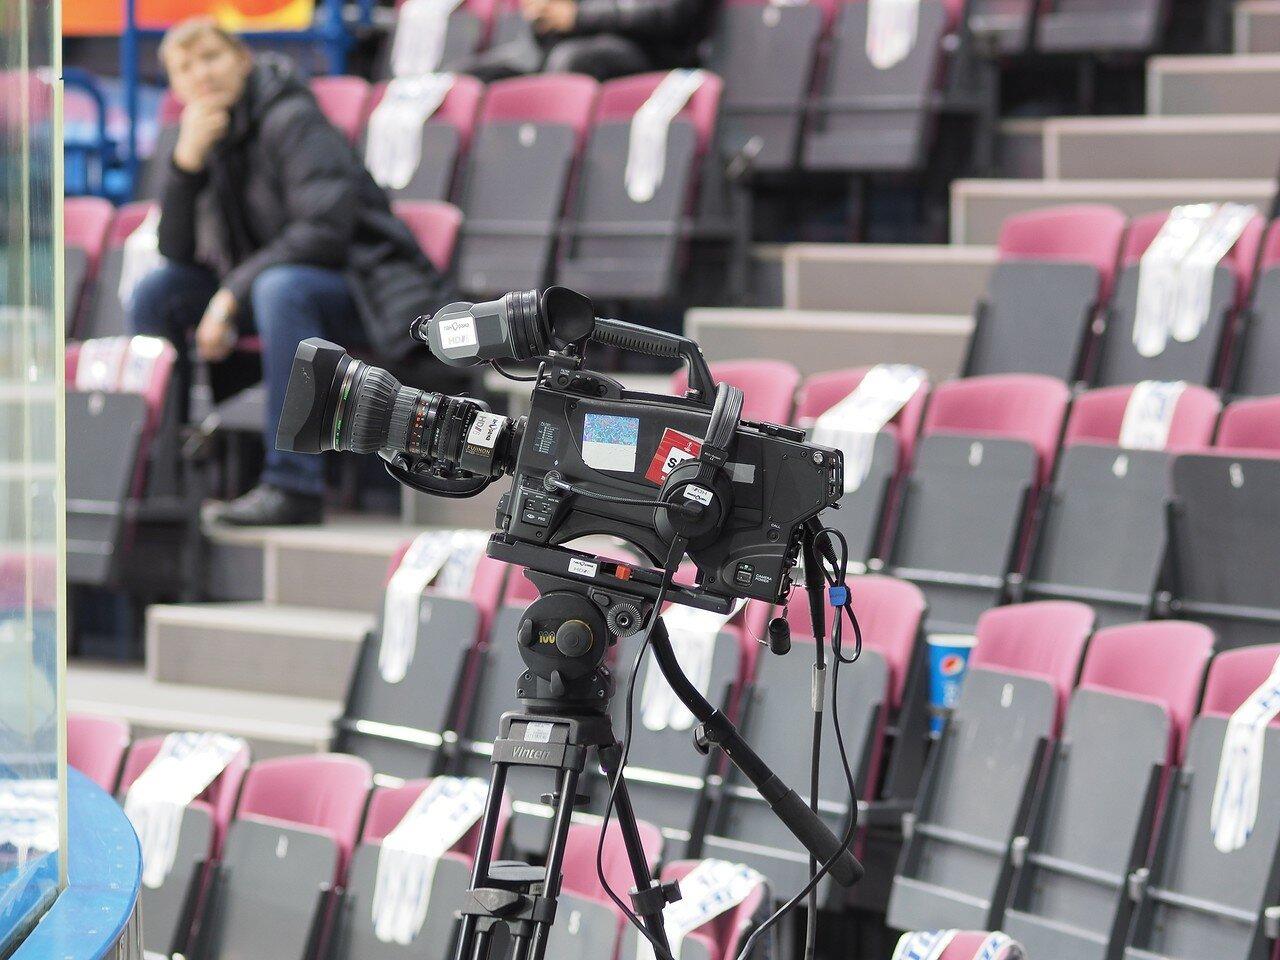 3Плей-офф 2016 Восток Финал Металлург - Салават Юлаев 23.03.2016